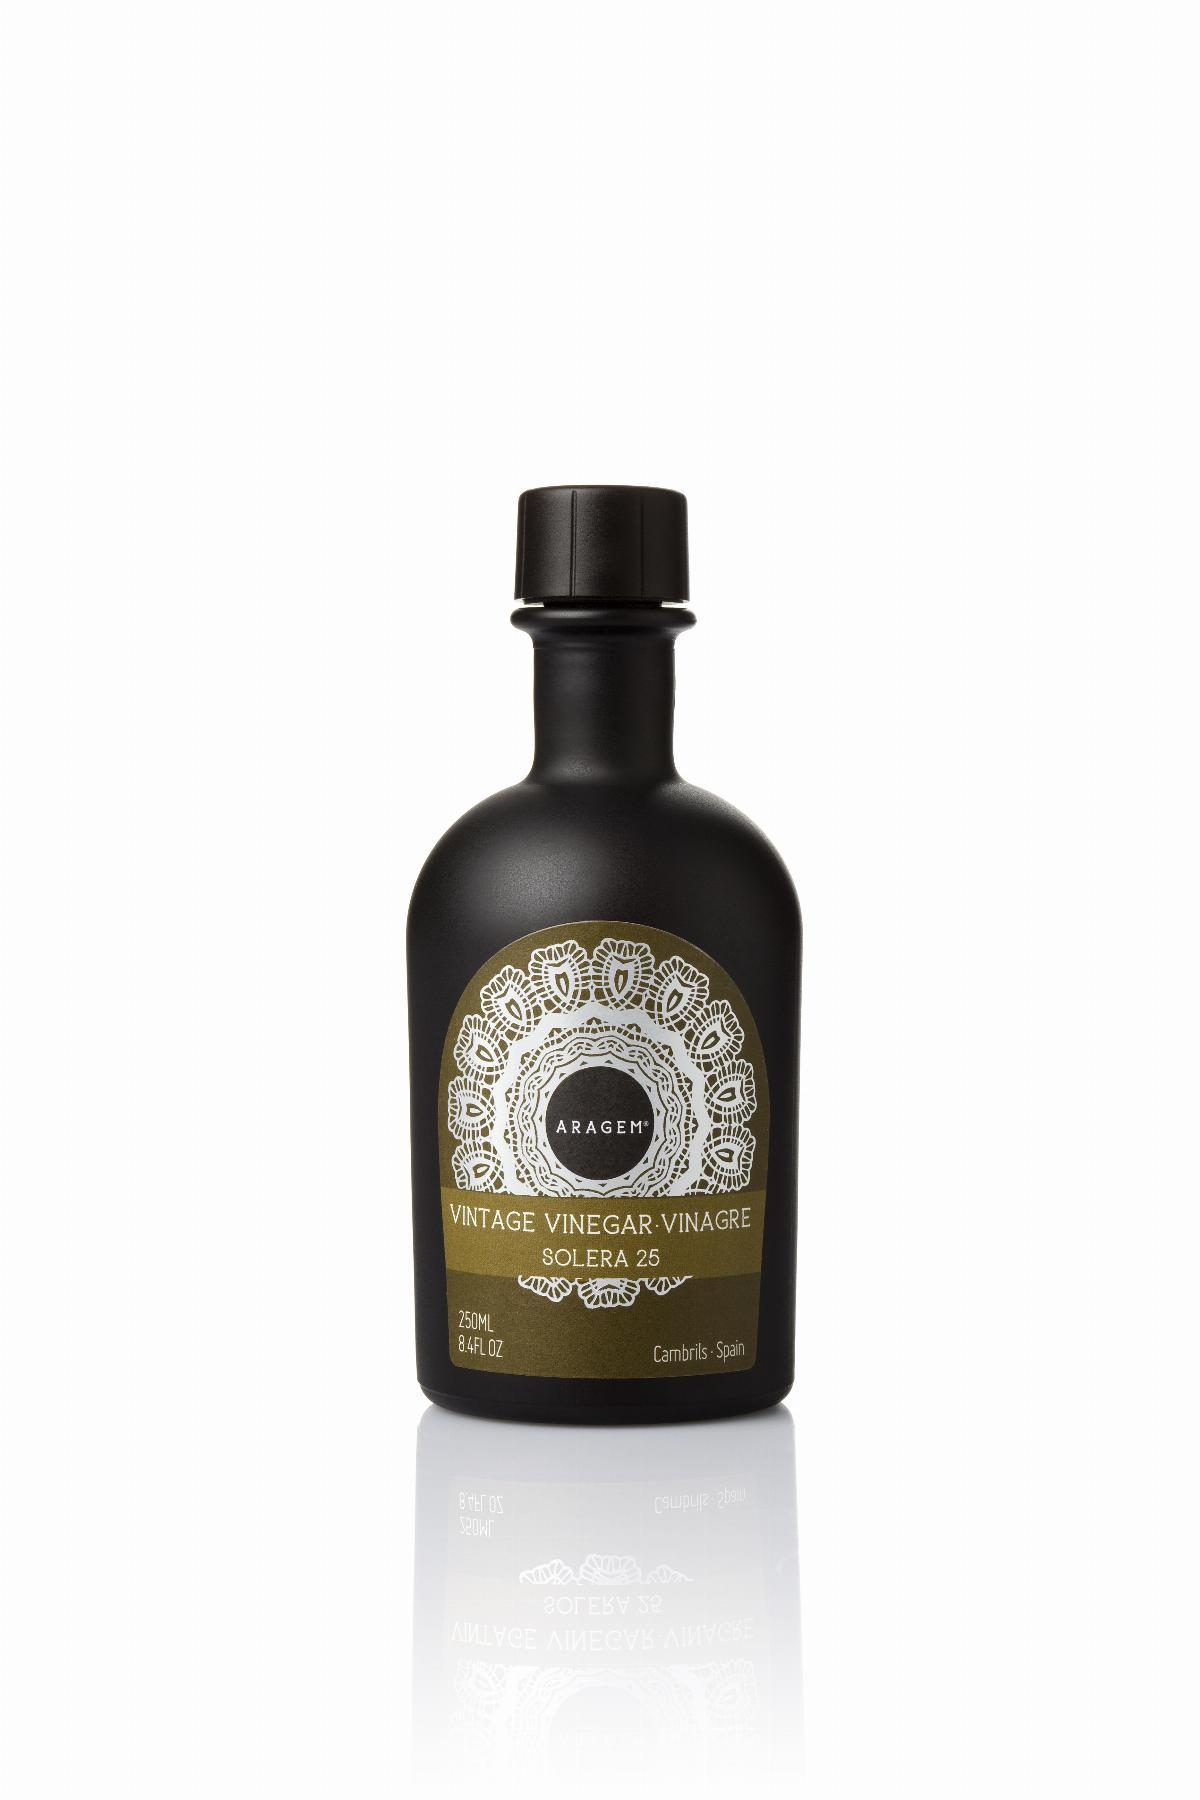 Vinagre de Solera Aragem ampolla negra 250ml